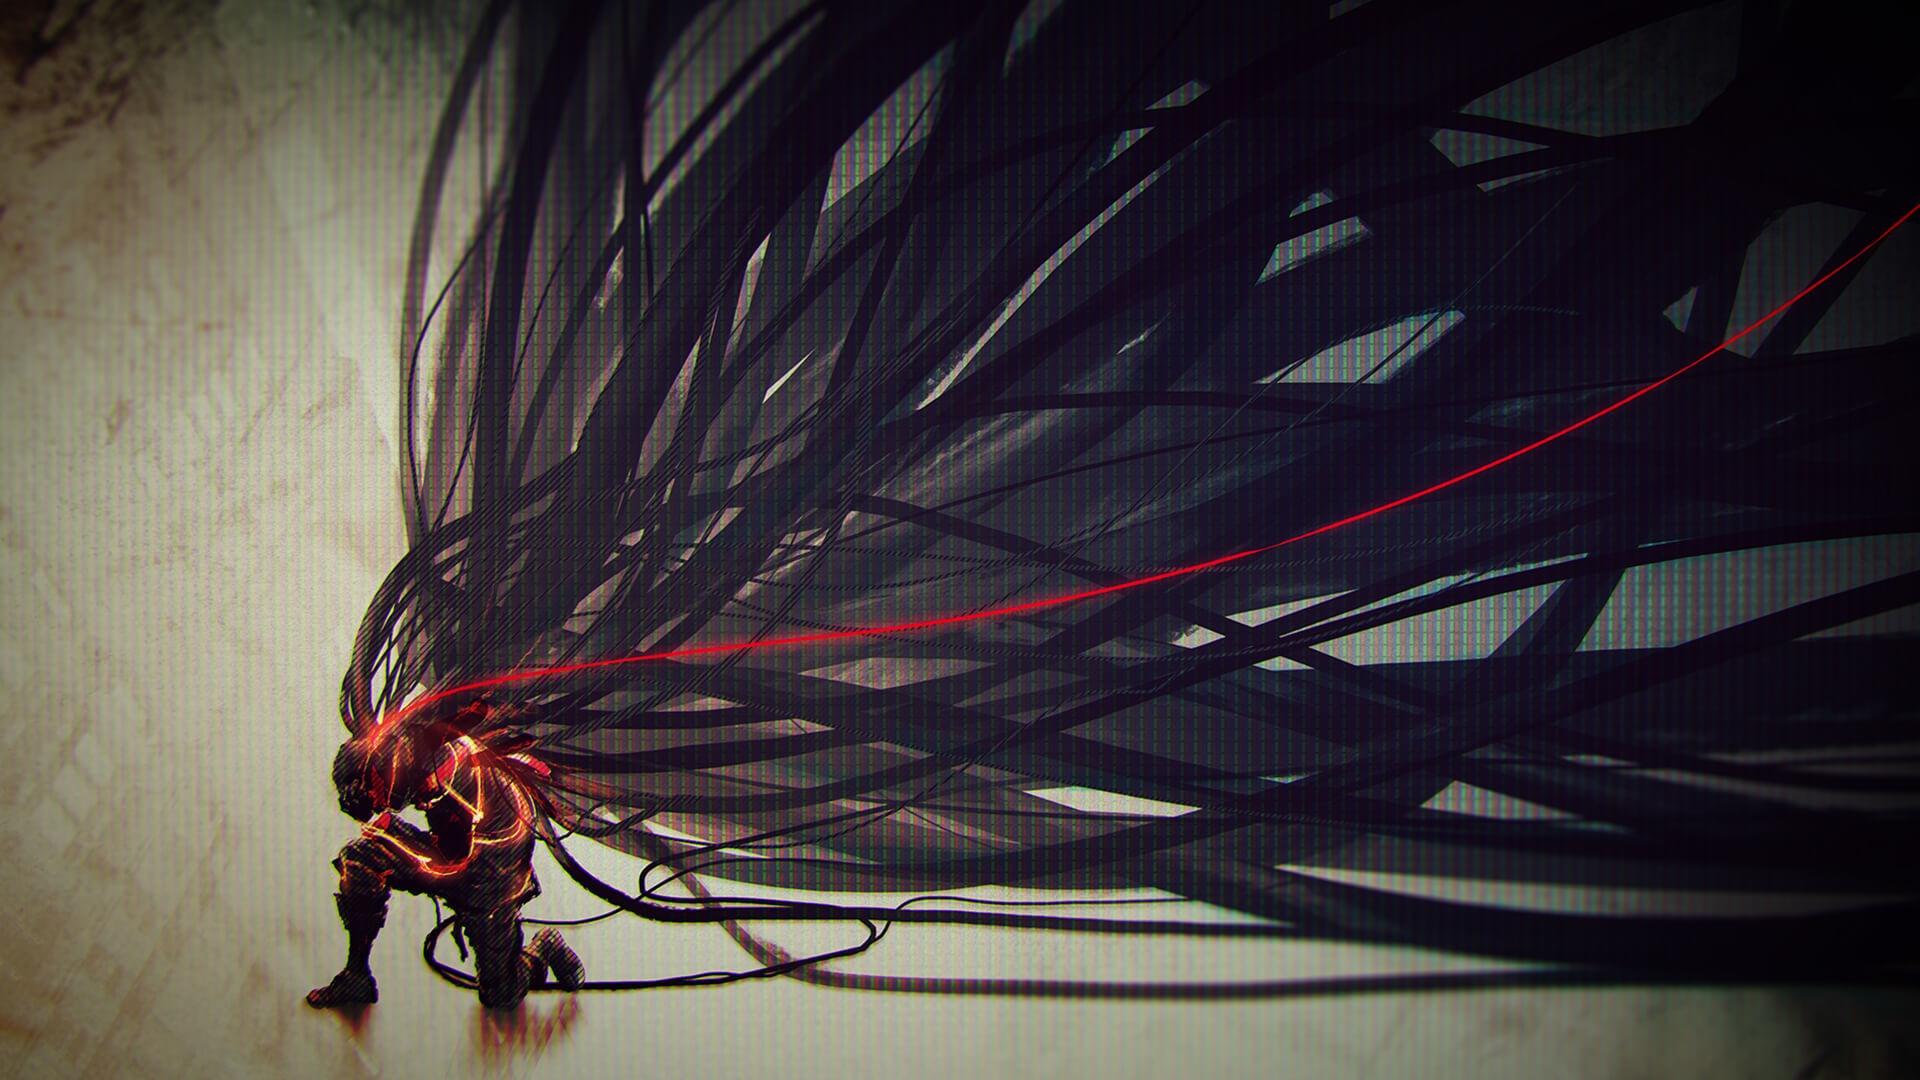 Scarlet Nexus 1080p wallpaper